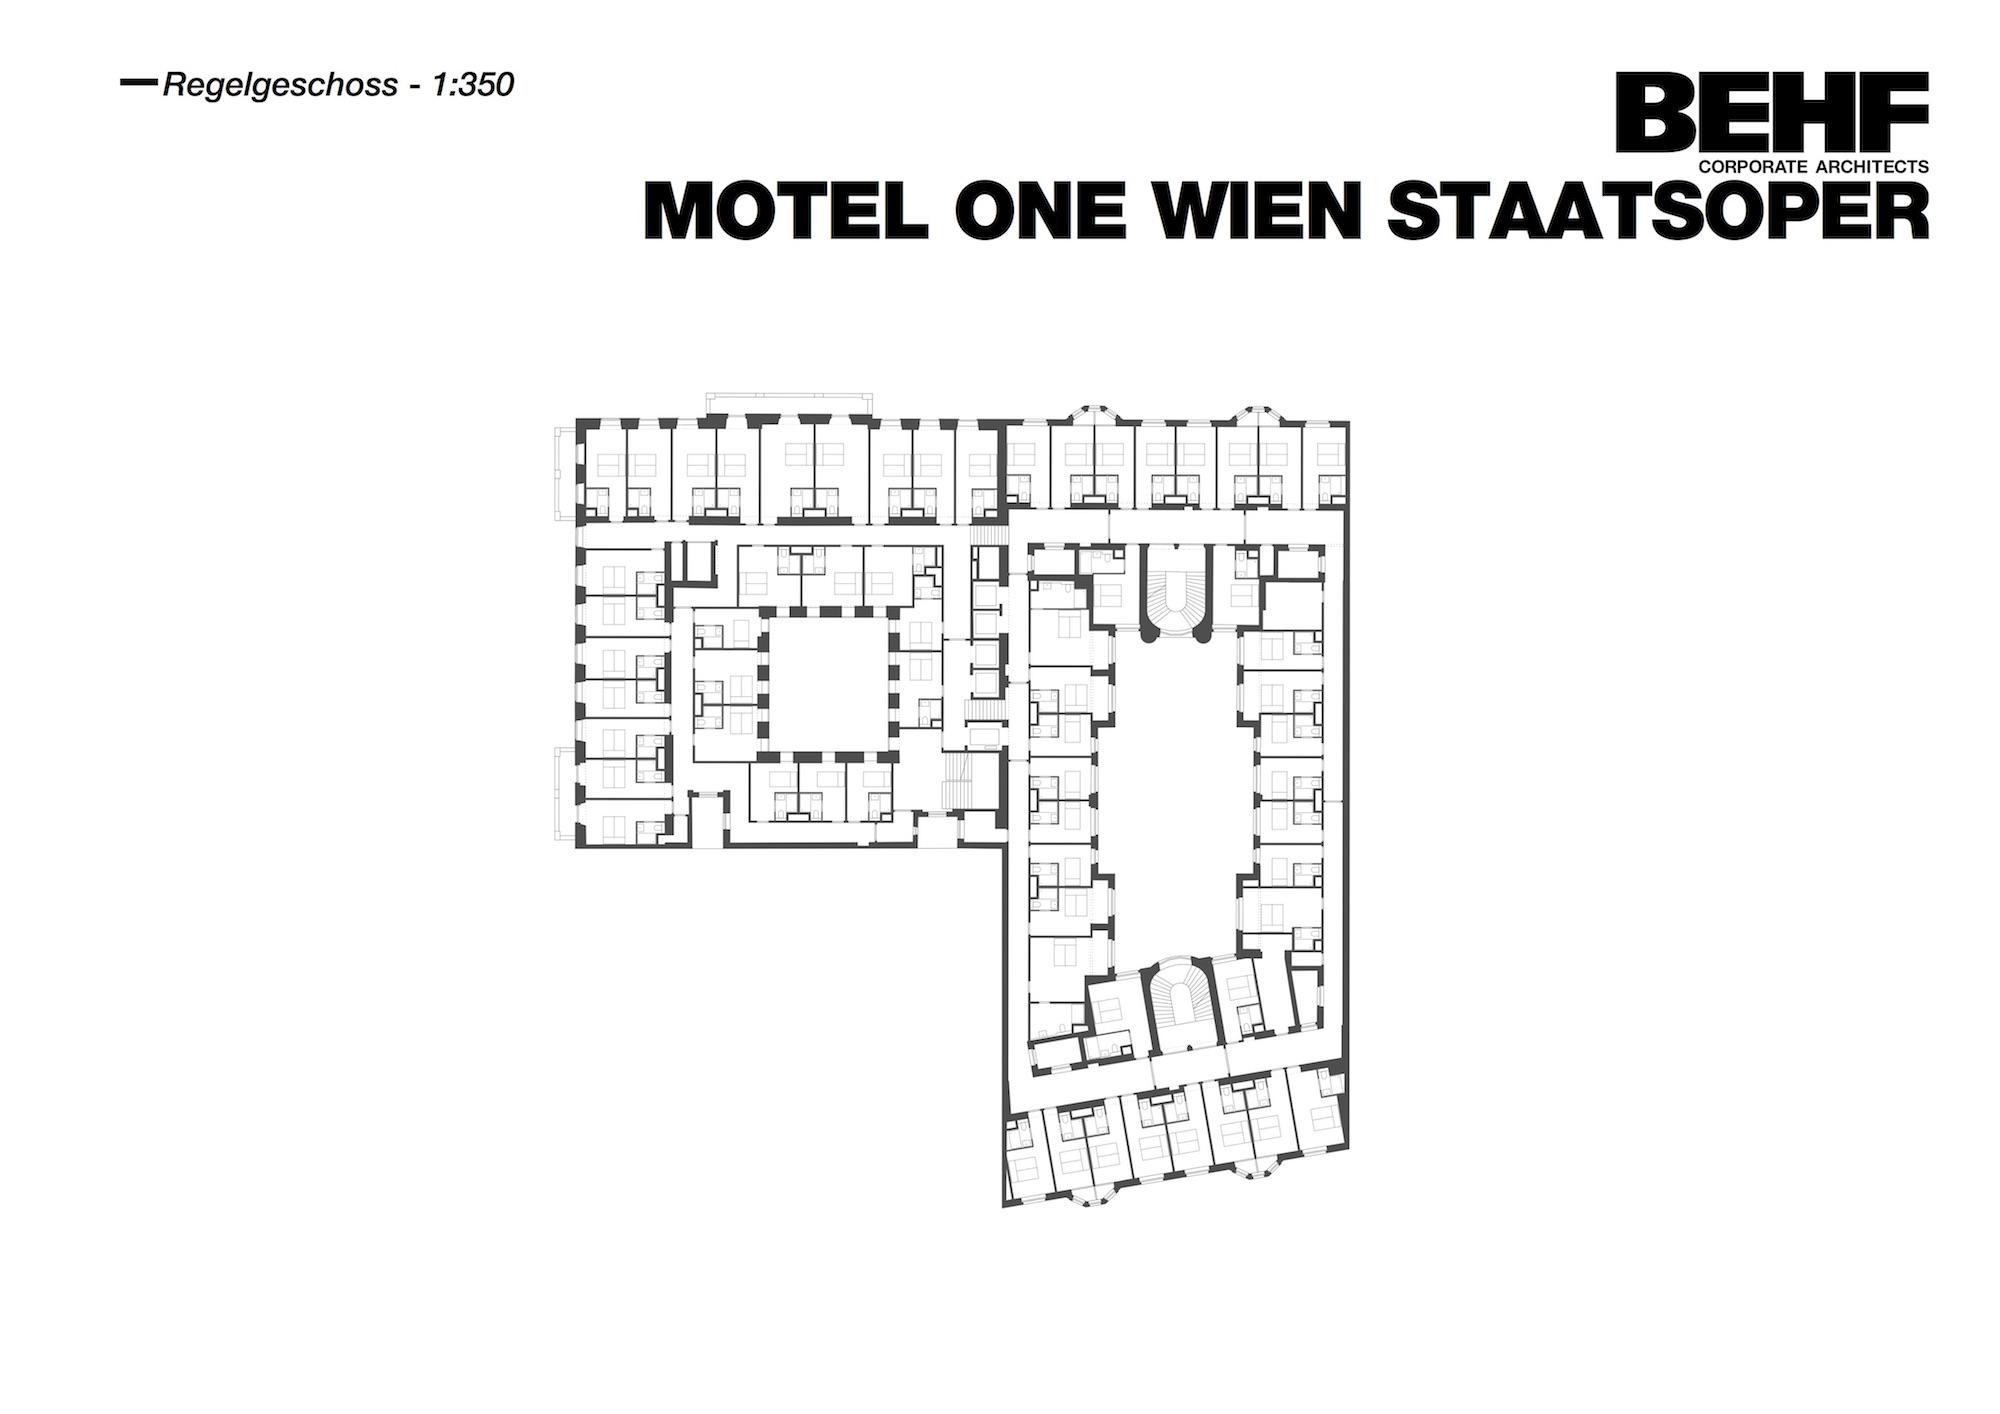 motel-one-wien-staatsoper-floor-plan